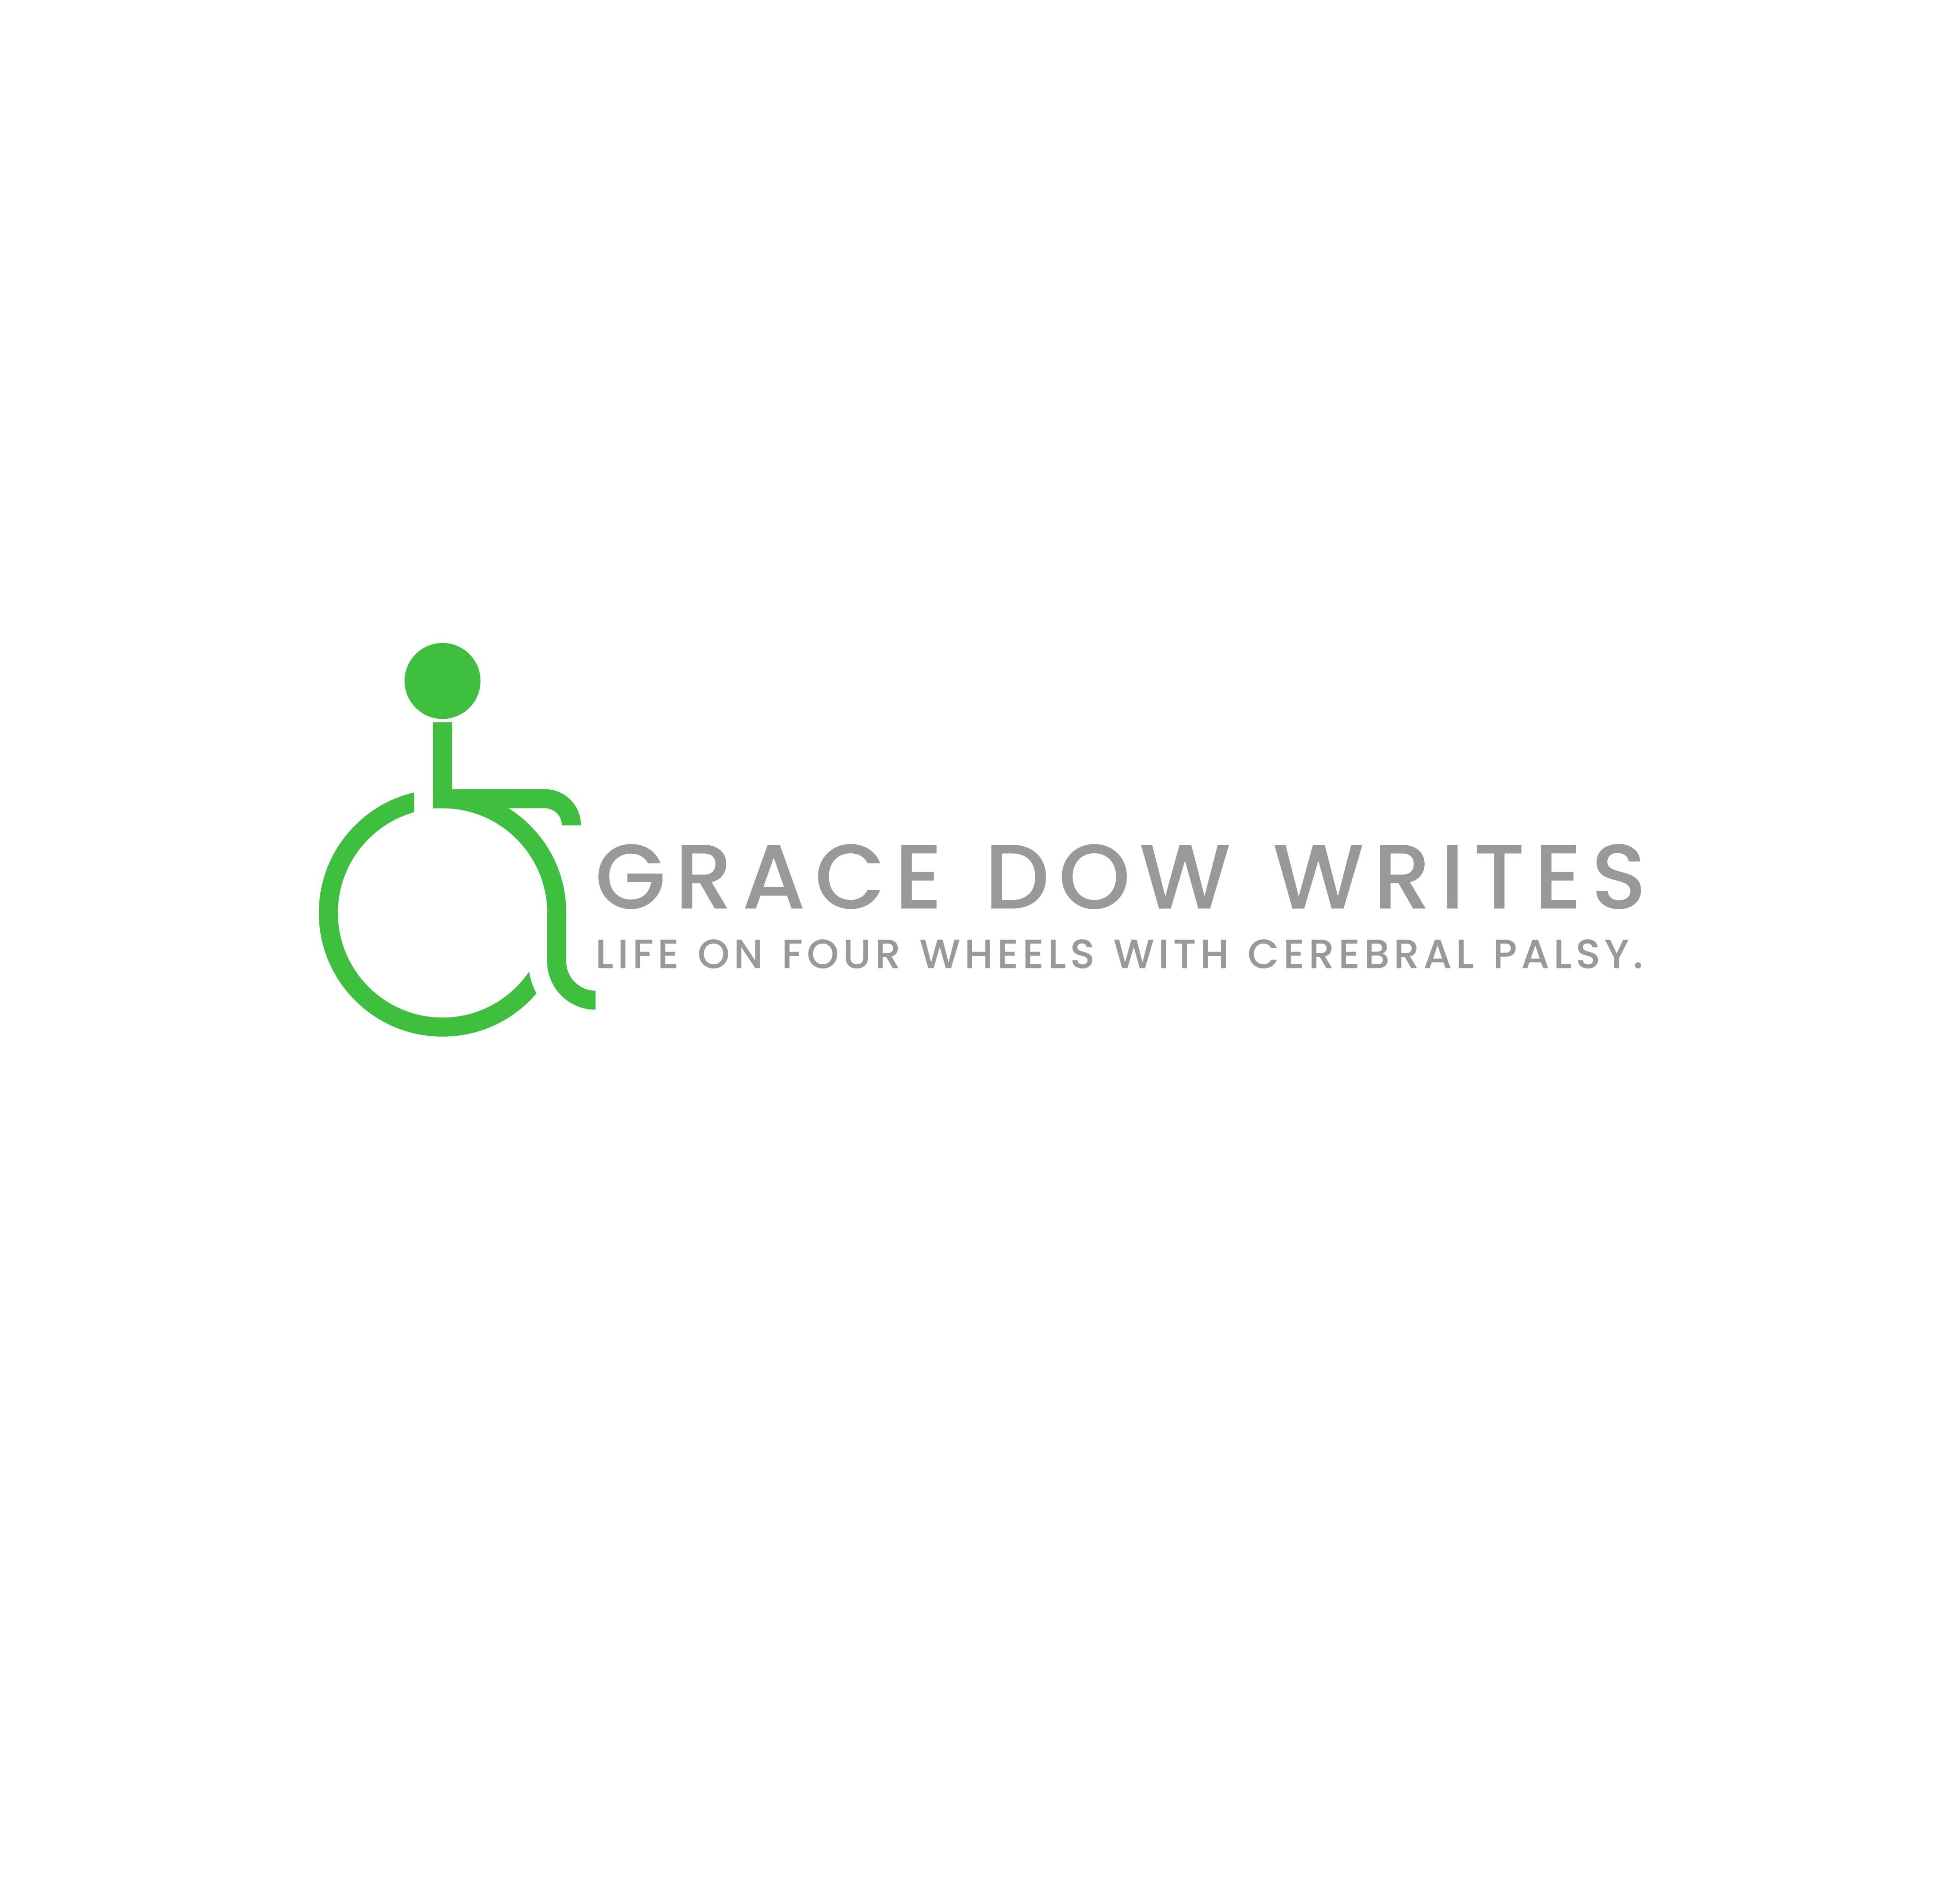 Grace Dow Writes: